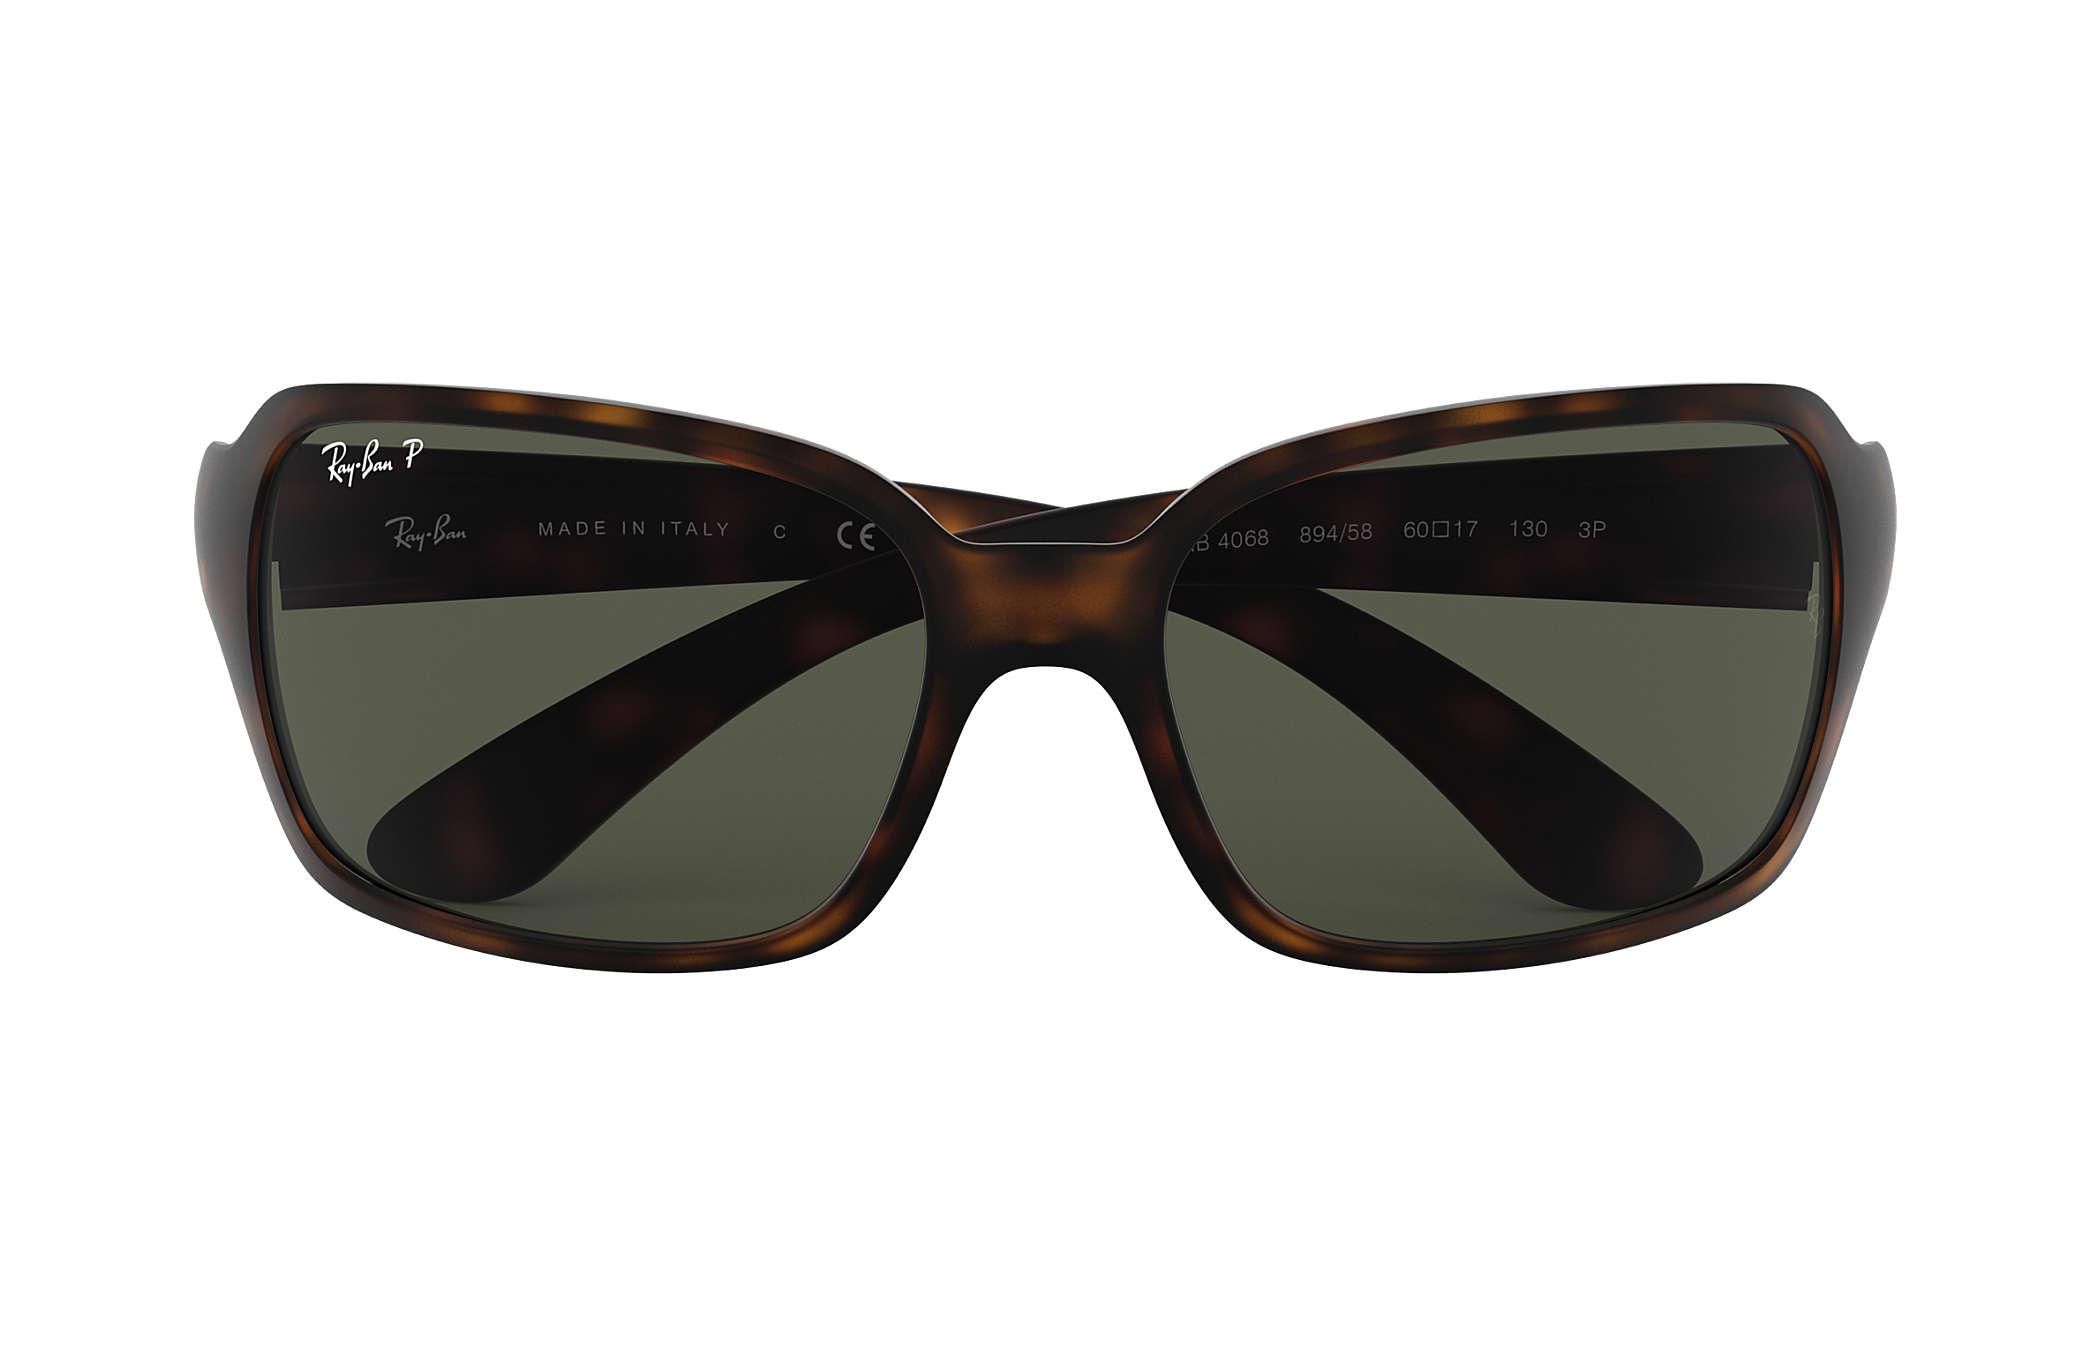 4c9fdc840d Ray-Ban RB4068 Tortoise - Nylon - Green Polarized Lenses ...